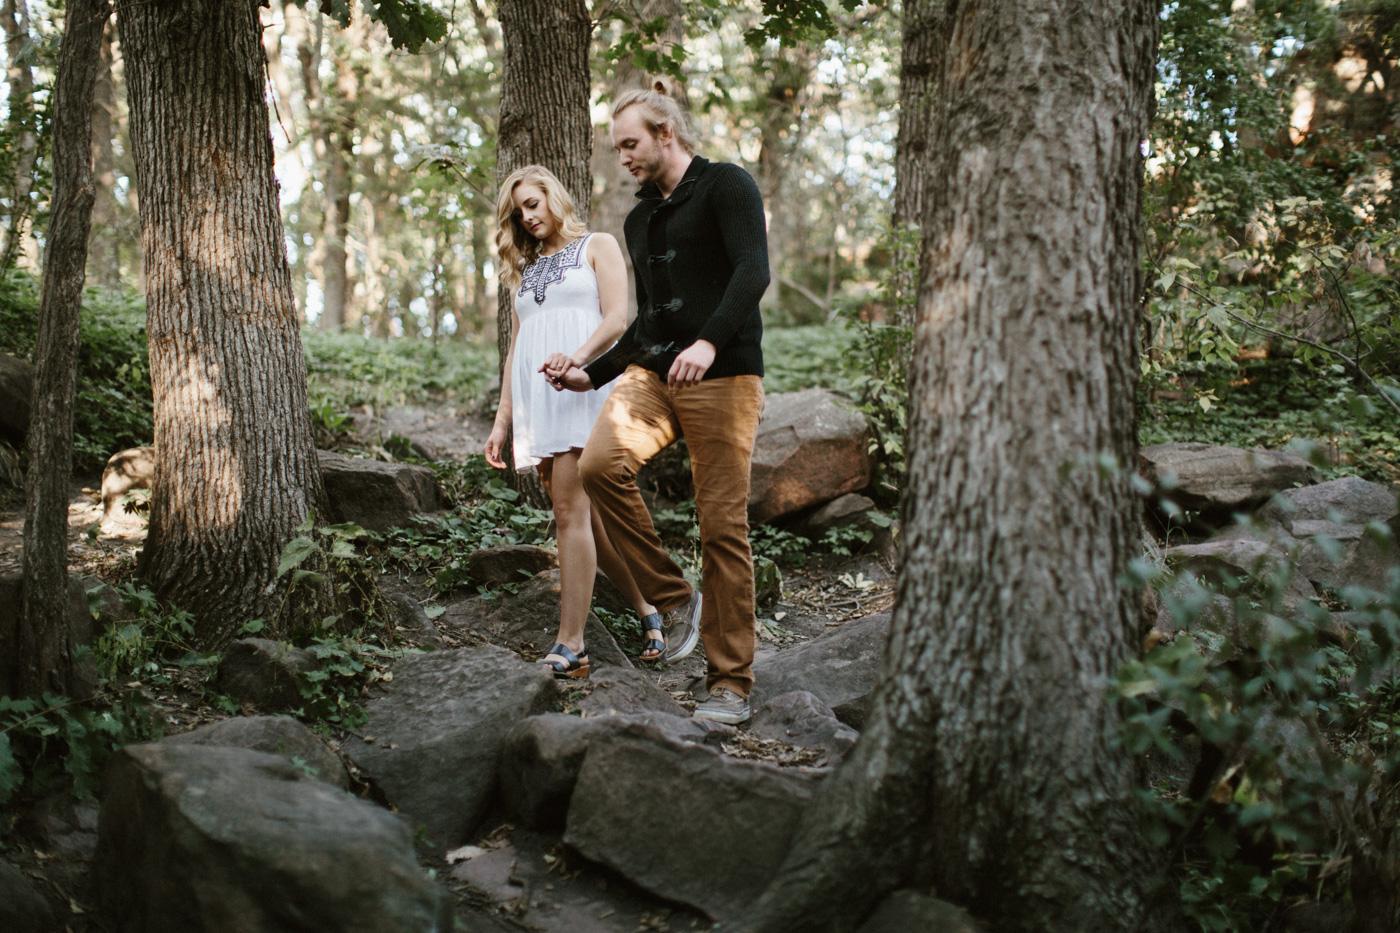 Sioux_Falls_Des_Moines_Engagement_Wedding_Photographer_01.jpg